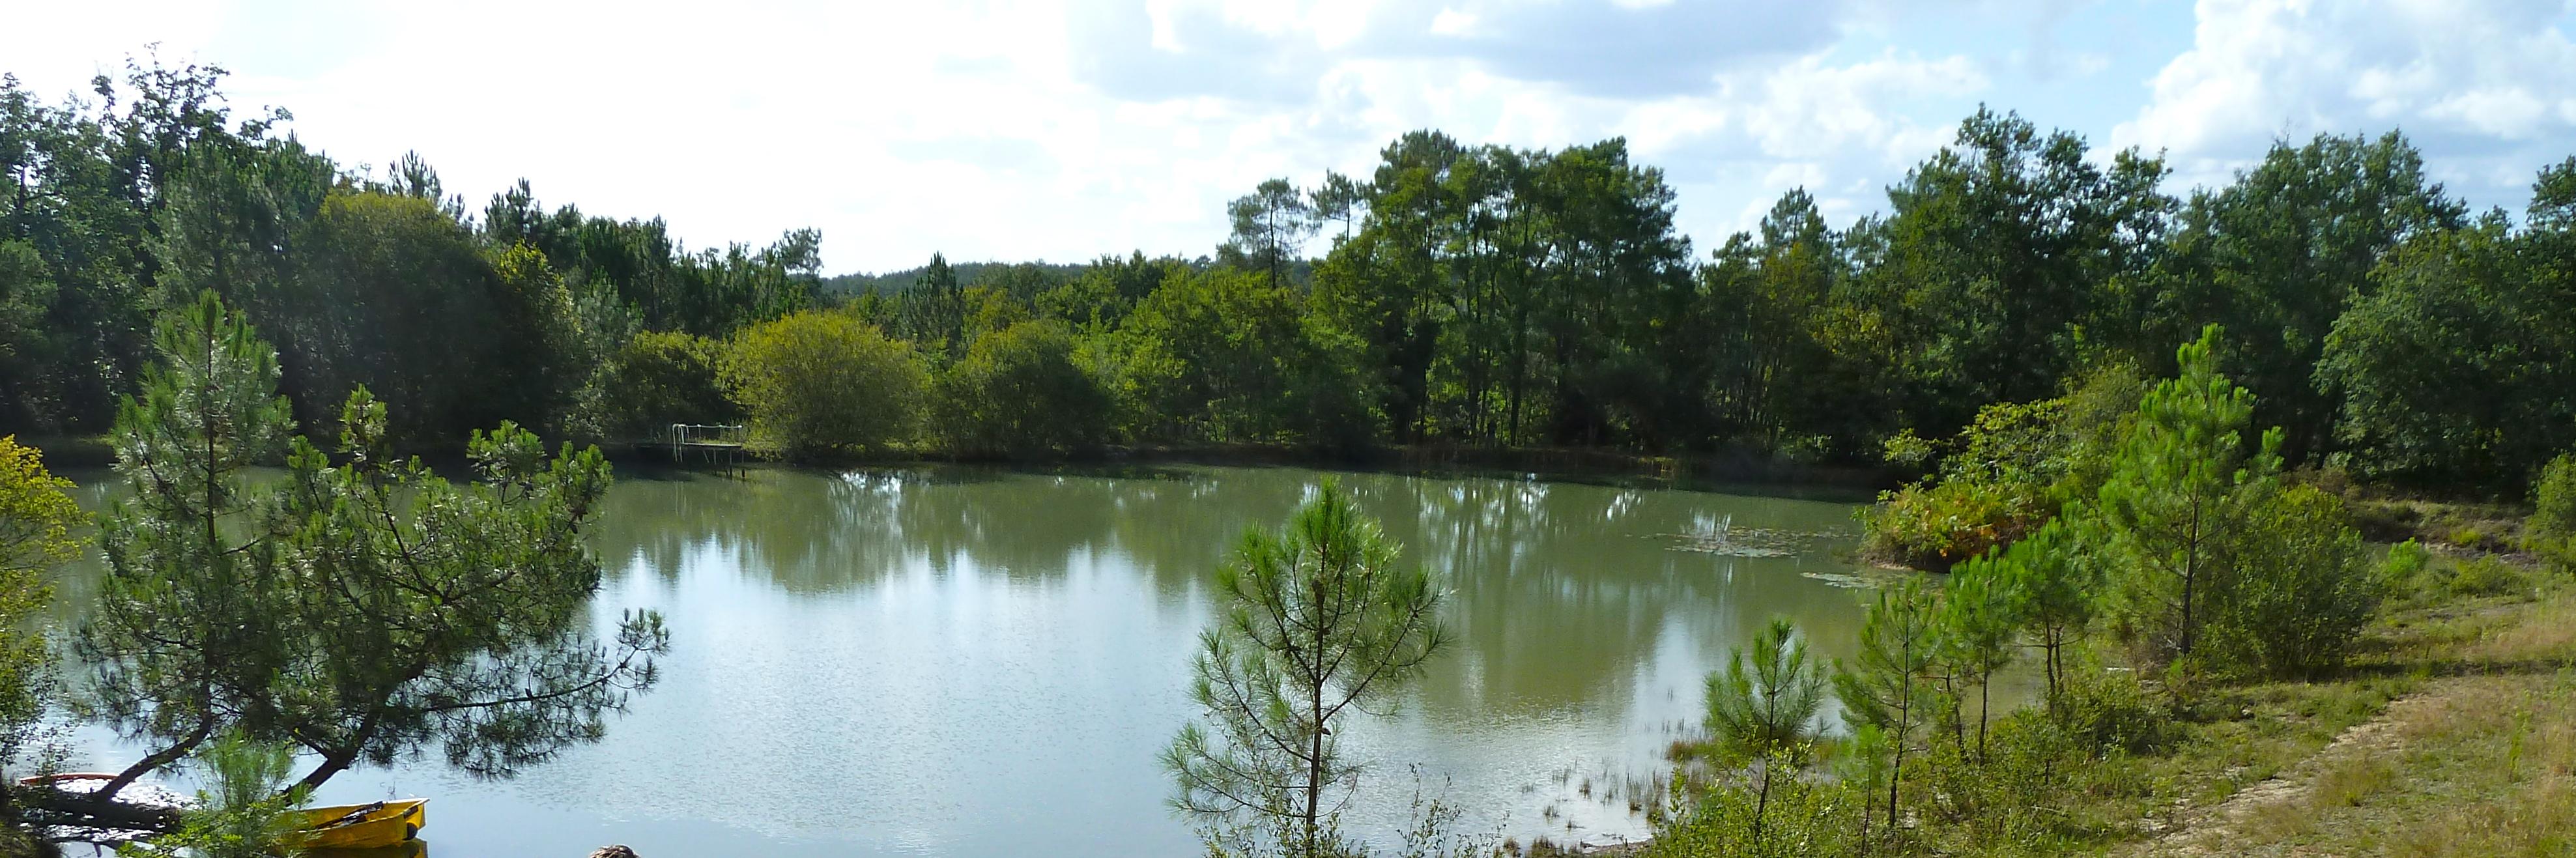 L'étang de jade